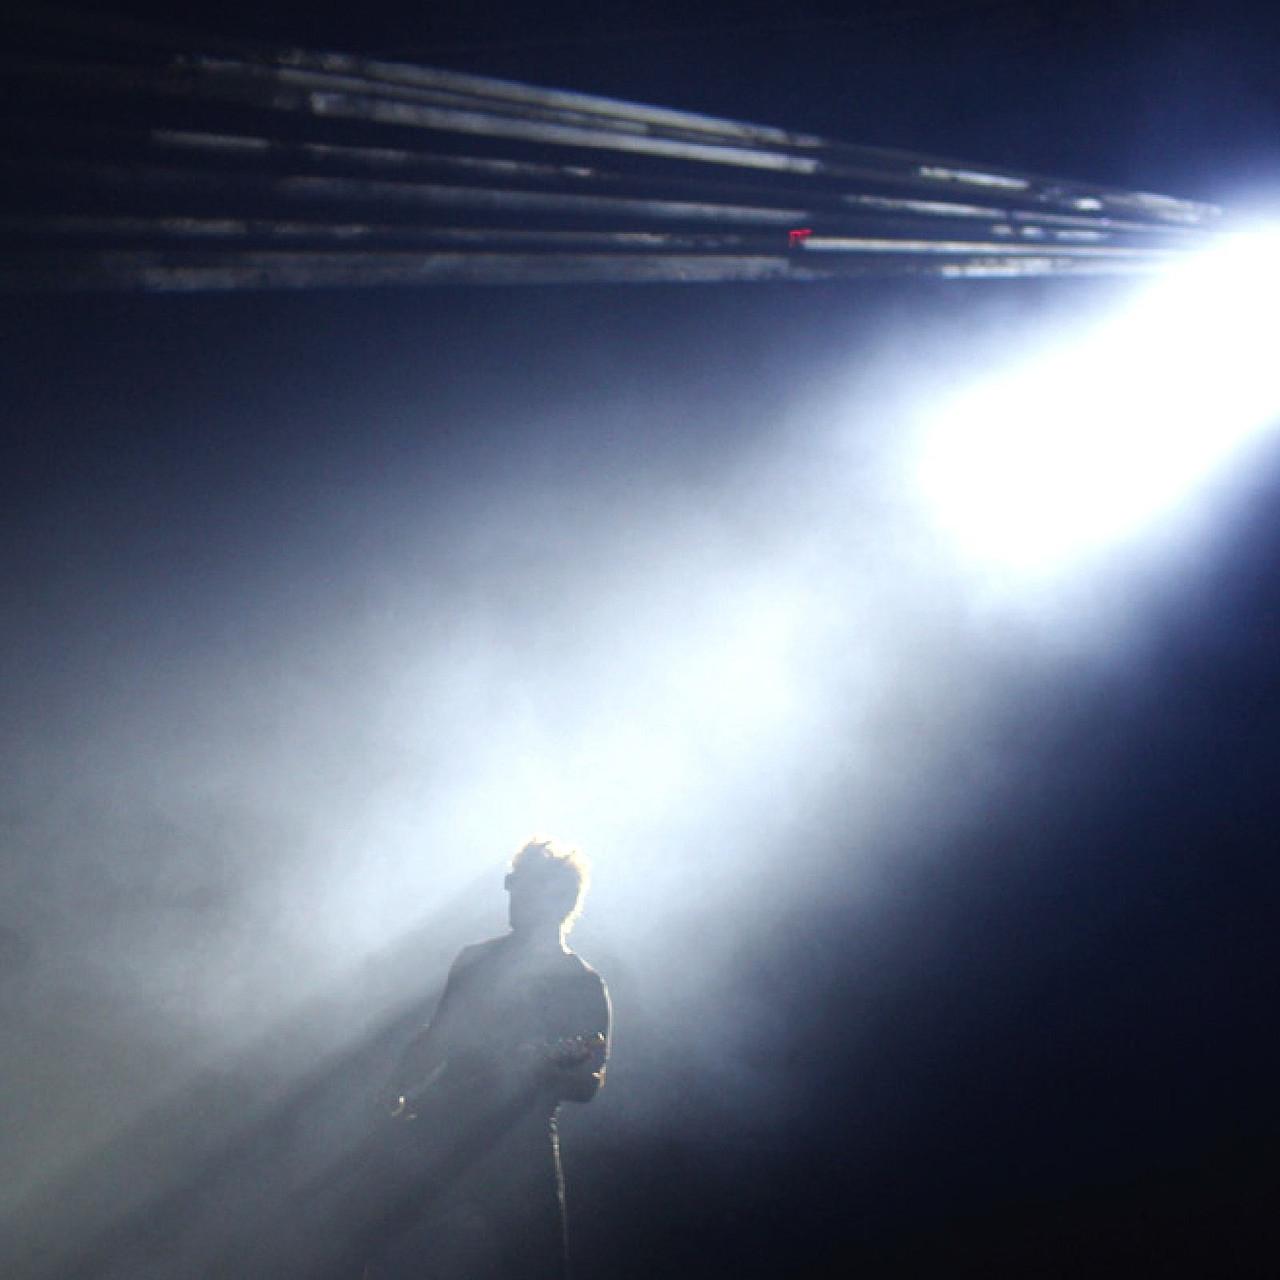 Chauvet DJ Hurricane Haze 1DX Haze Machine / Water-based / DMX